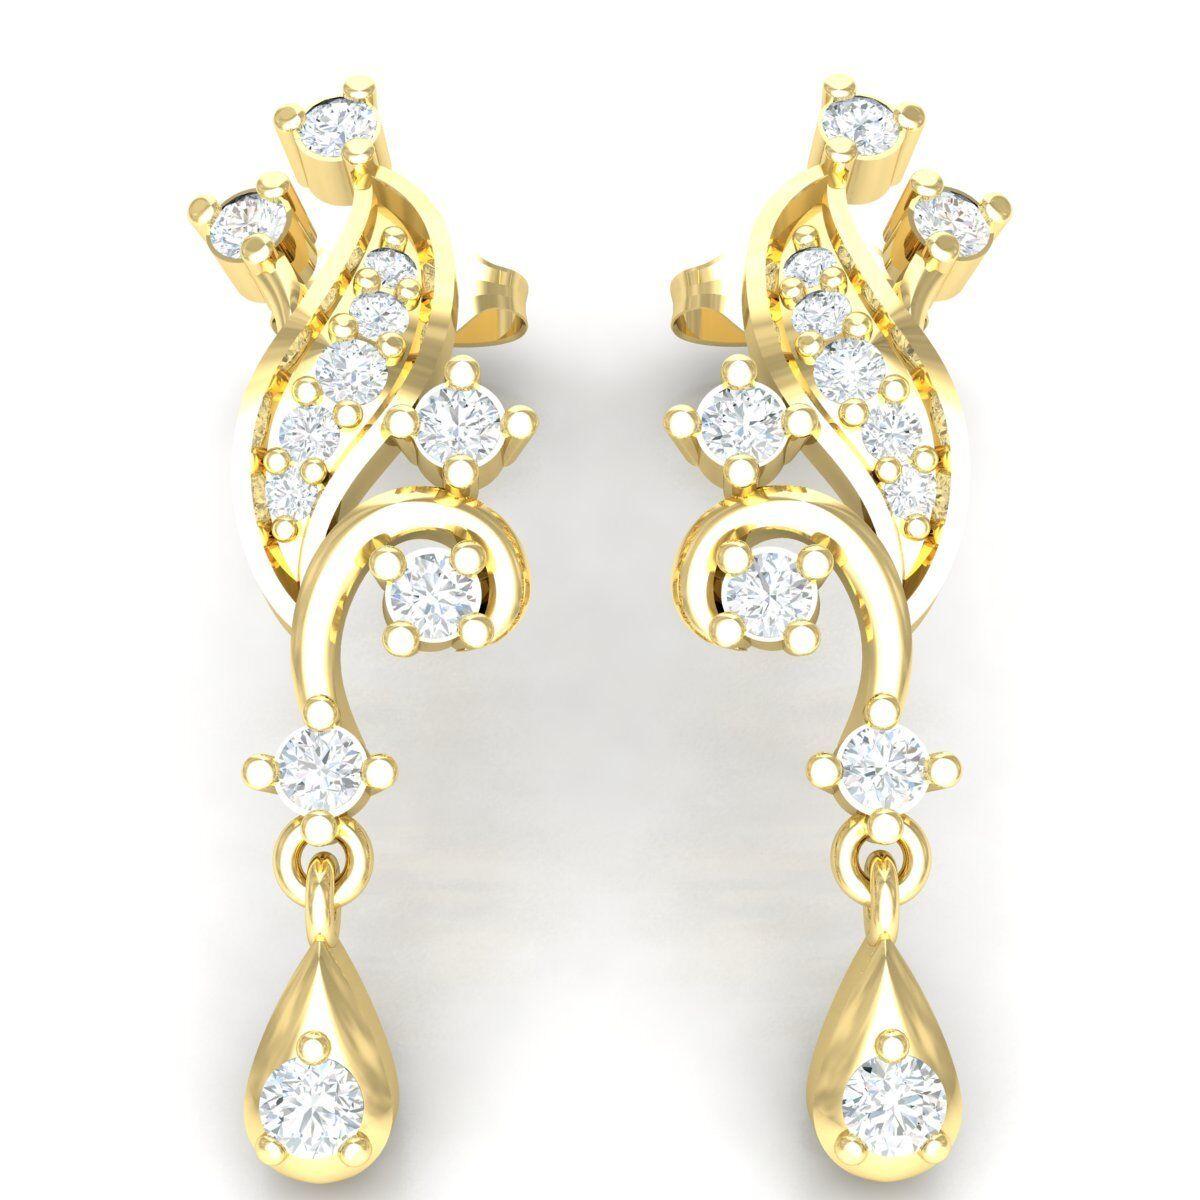 0.33ct Round Cut Genuine Diamond 10K Yellow gold Earrings Women's Stylish Drop